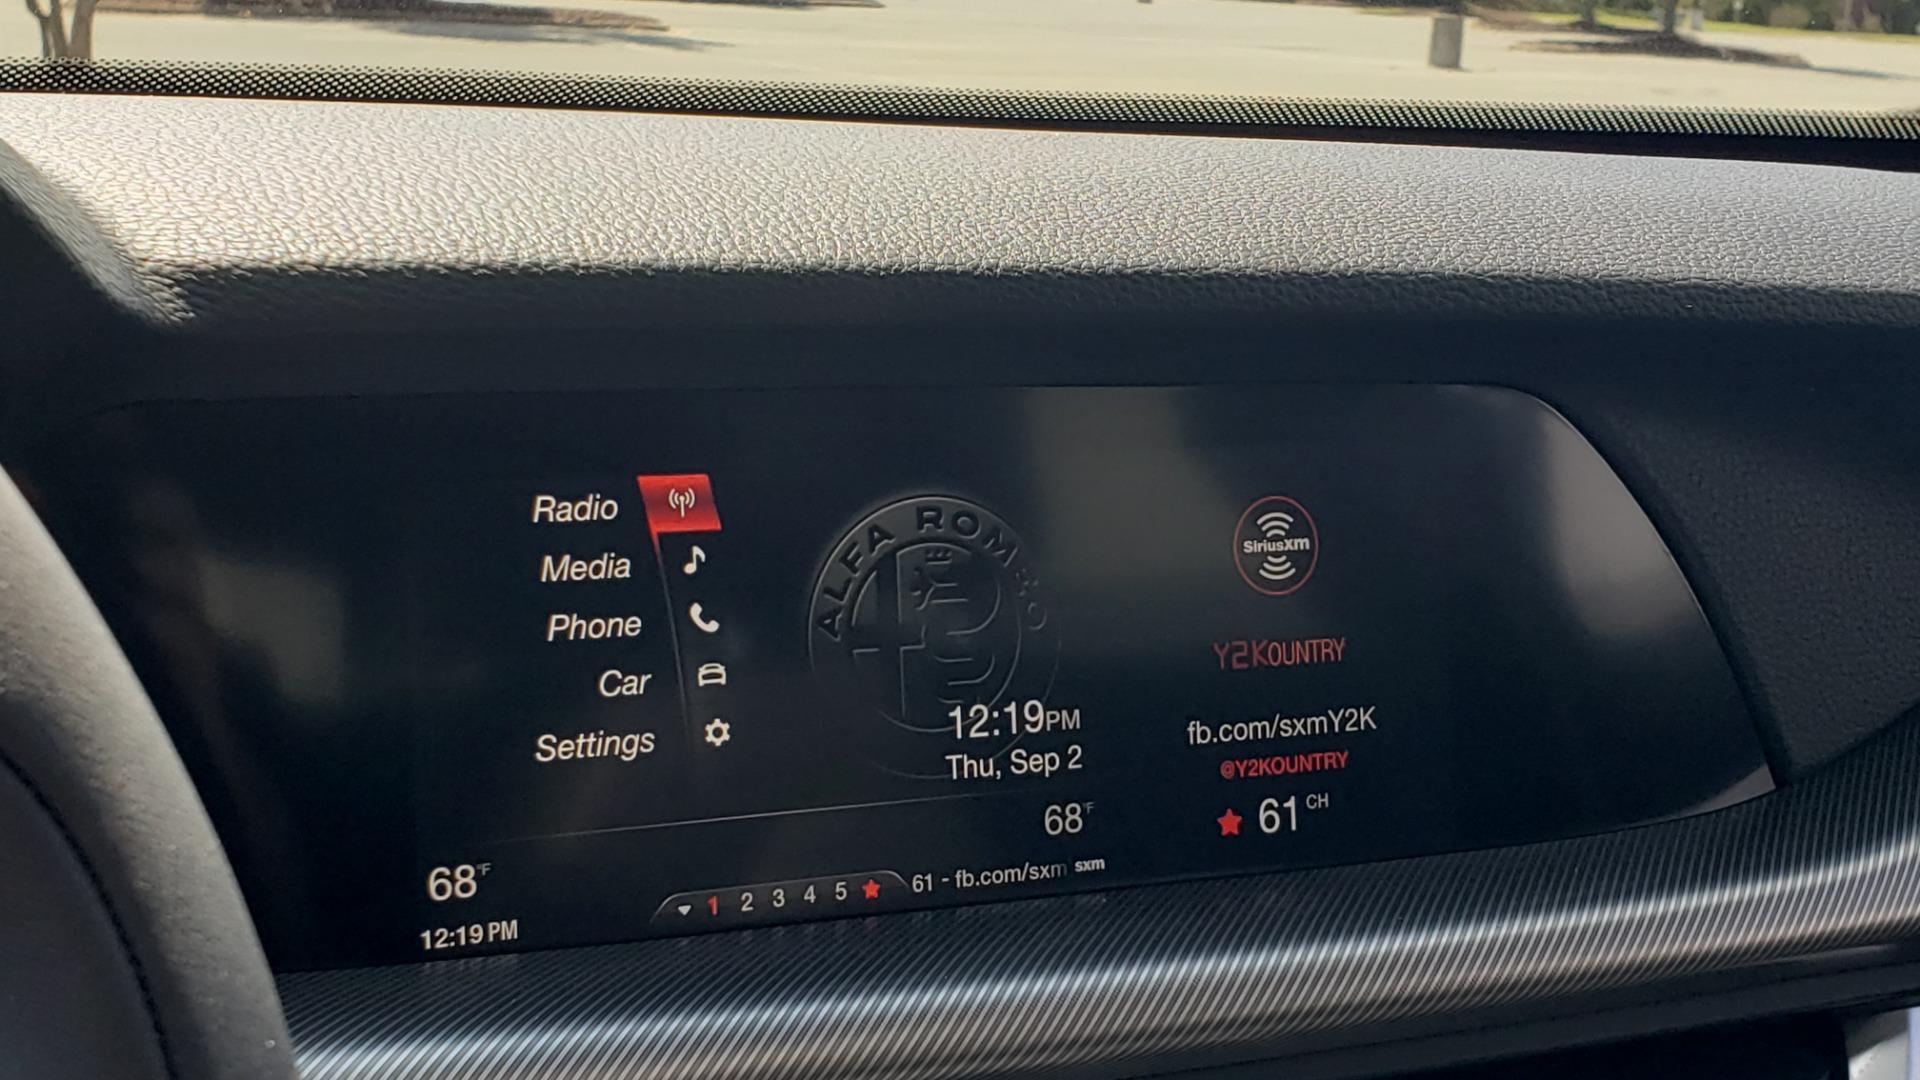 Used 2019 Alfa Romeo STELVIO TI SPORT AWD / 2.0L TURBO / 8-SPD AUTO / DRVR ASST / REARVIEW for sale $37,495 at Formula Imports in Charlotte NC 28227 53